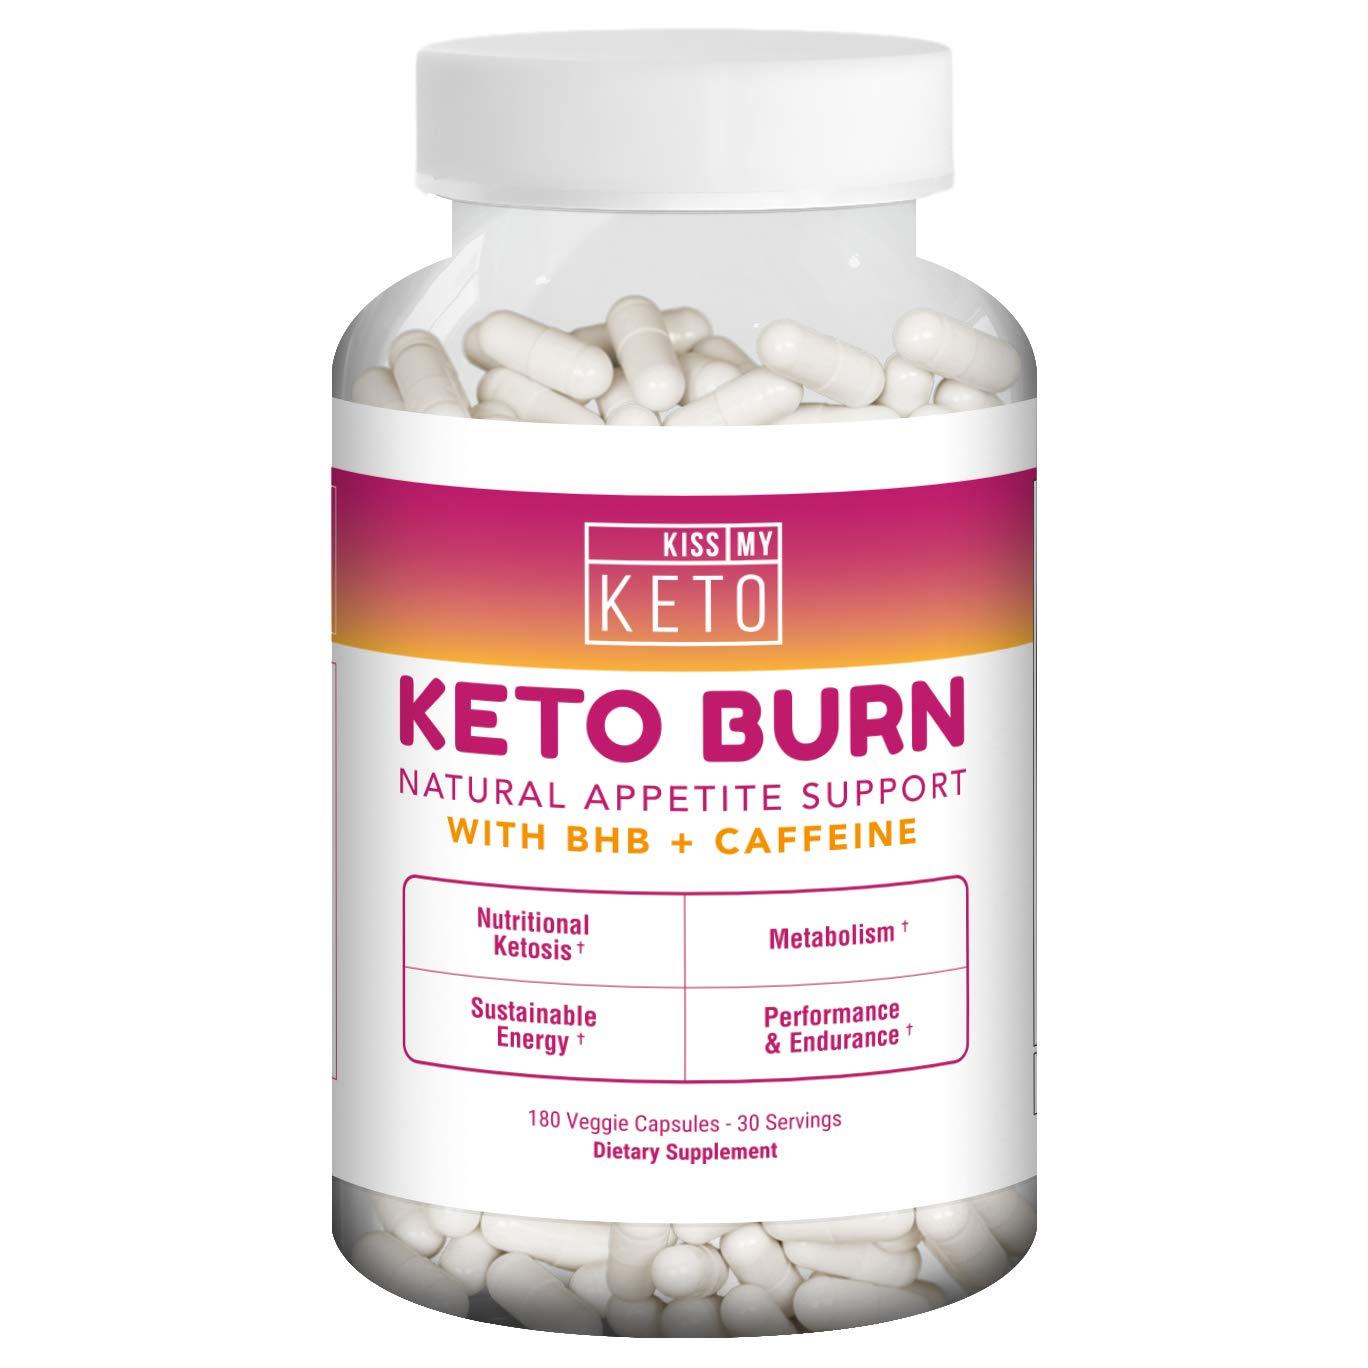 Kiss My Keto Burn Capsules - 180 Veggie Caps, Exogenous Ketones Capsules with BHB Salts as Ketones for Appetite Support w/Caffeine, Apple Cider Vinegar, L-Carnitine, CLA, Garcinia Cambogia